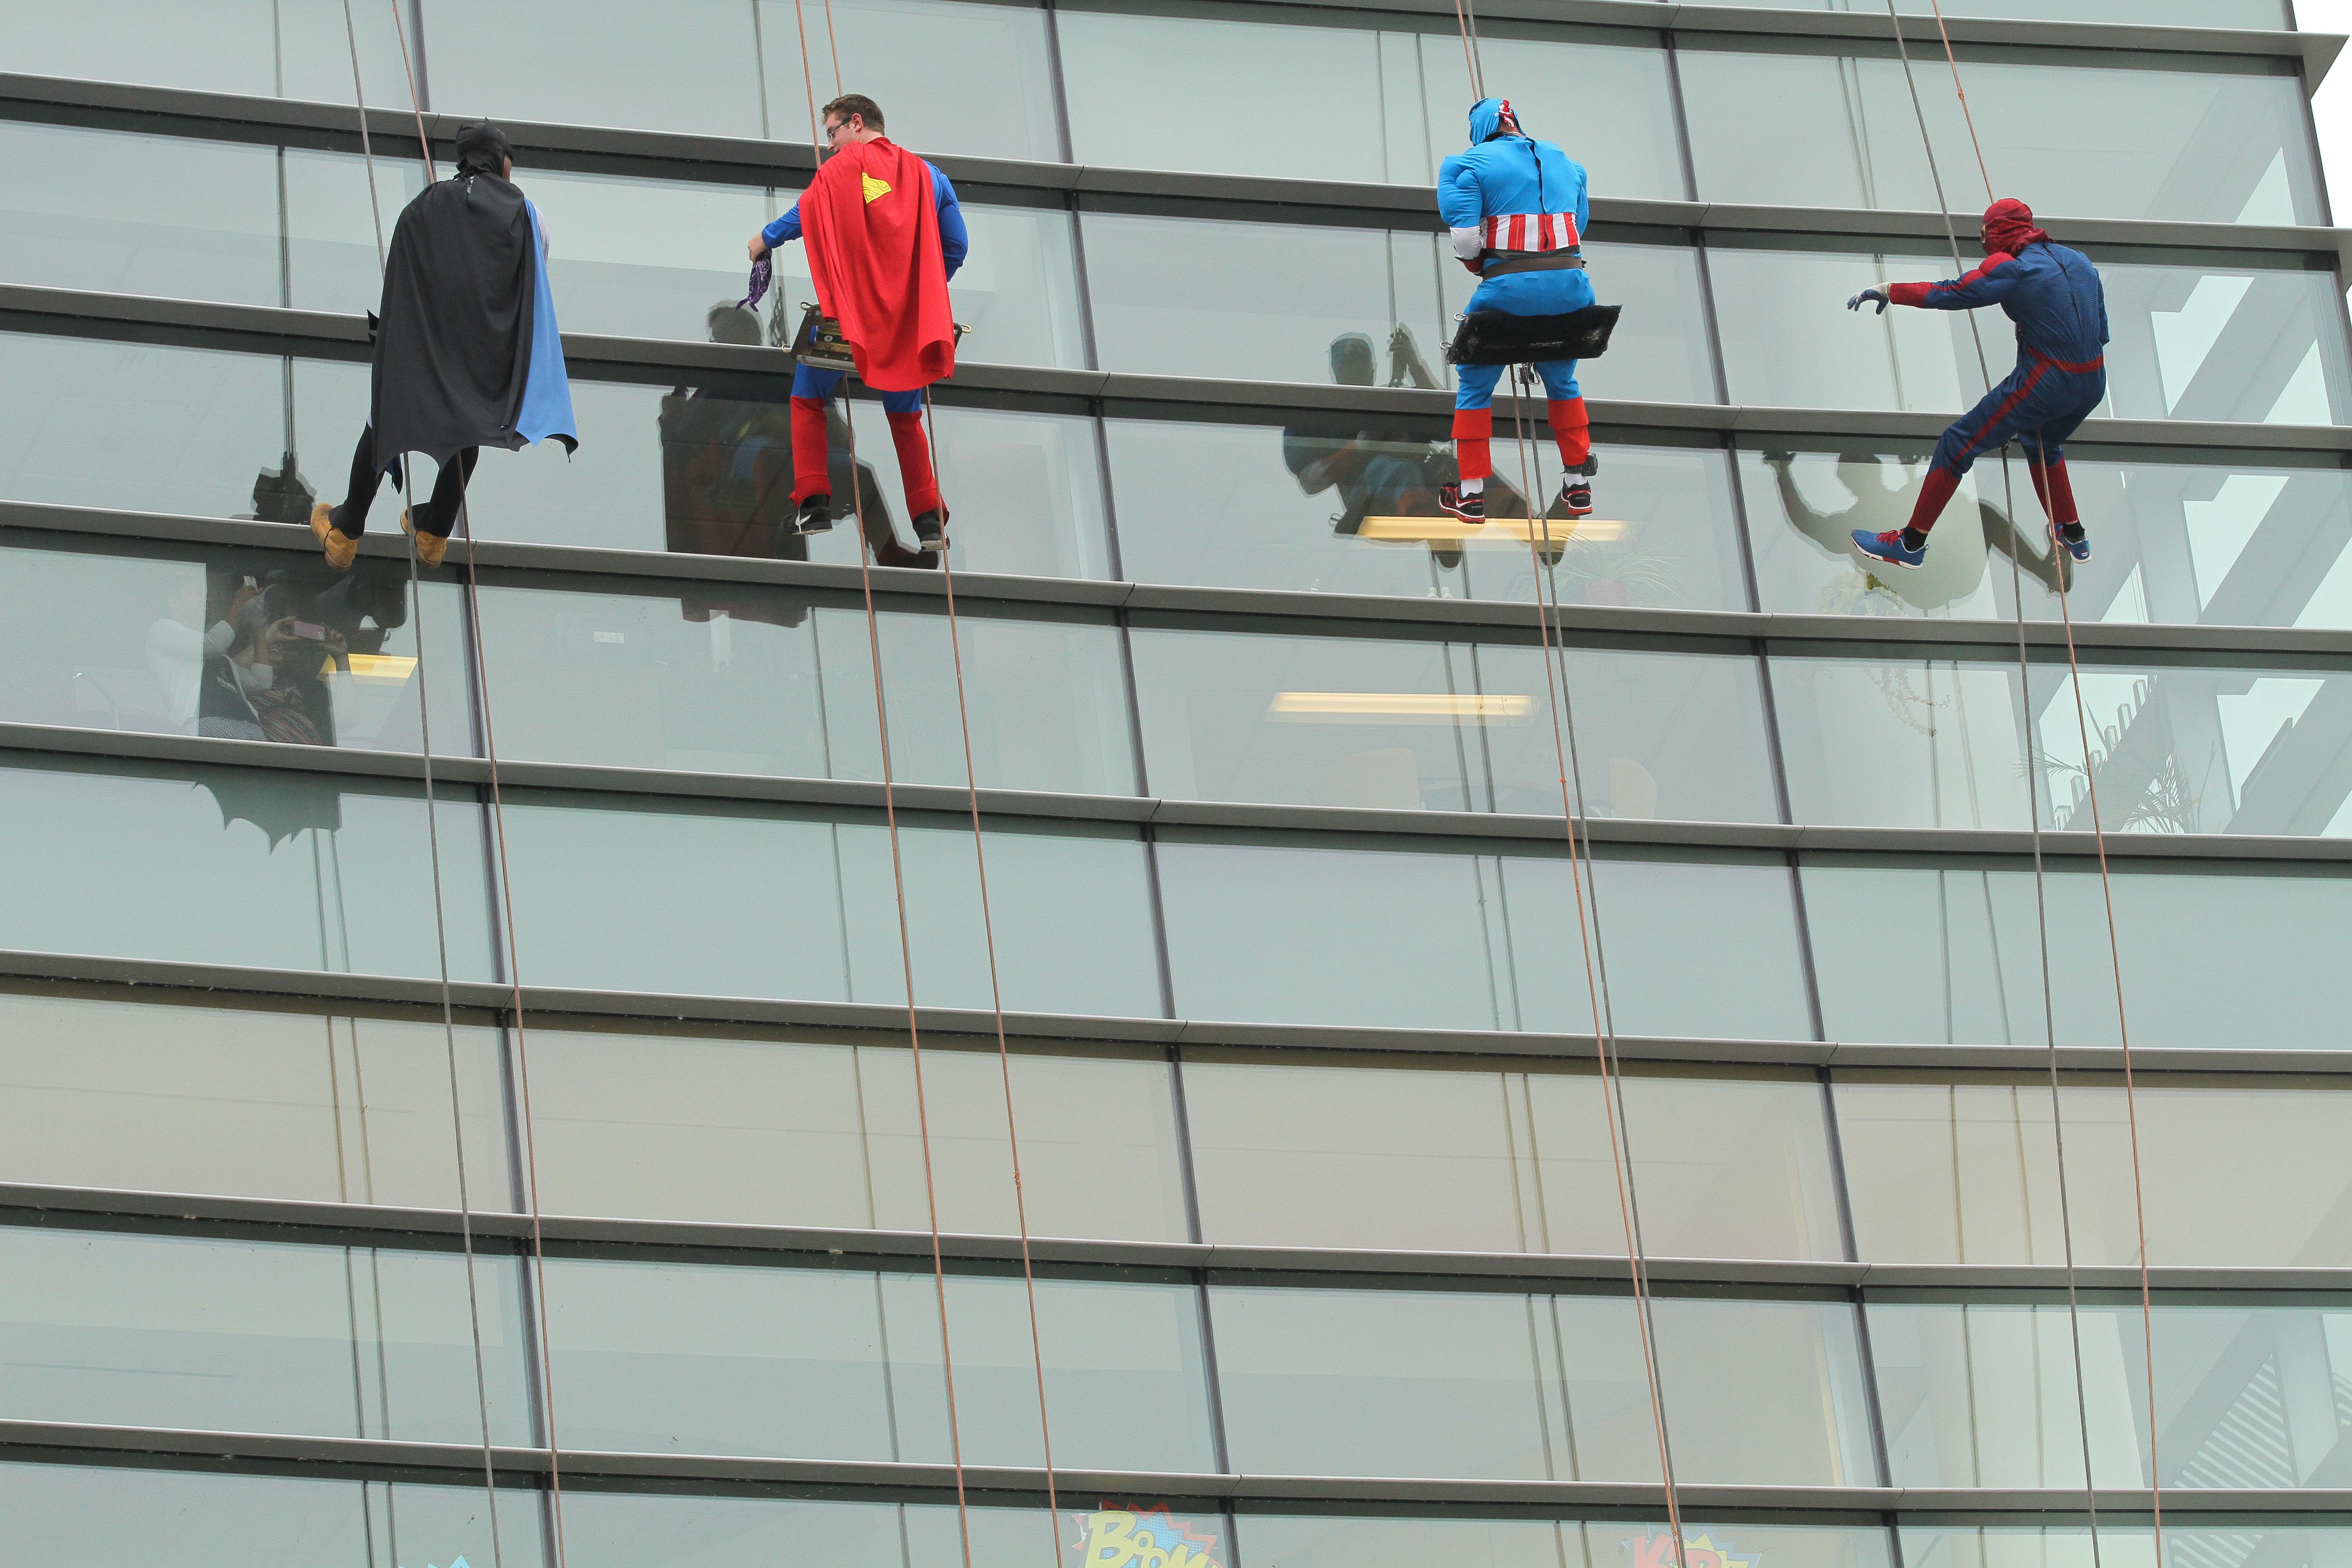 Super heroes visit Penn State Hershey Children's Hospital